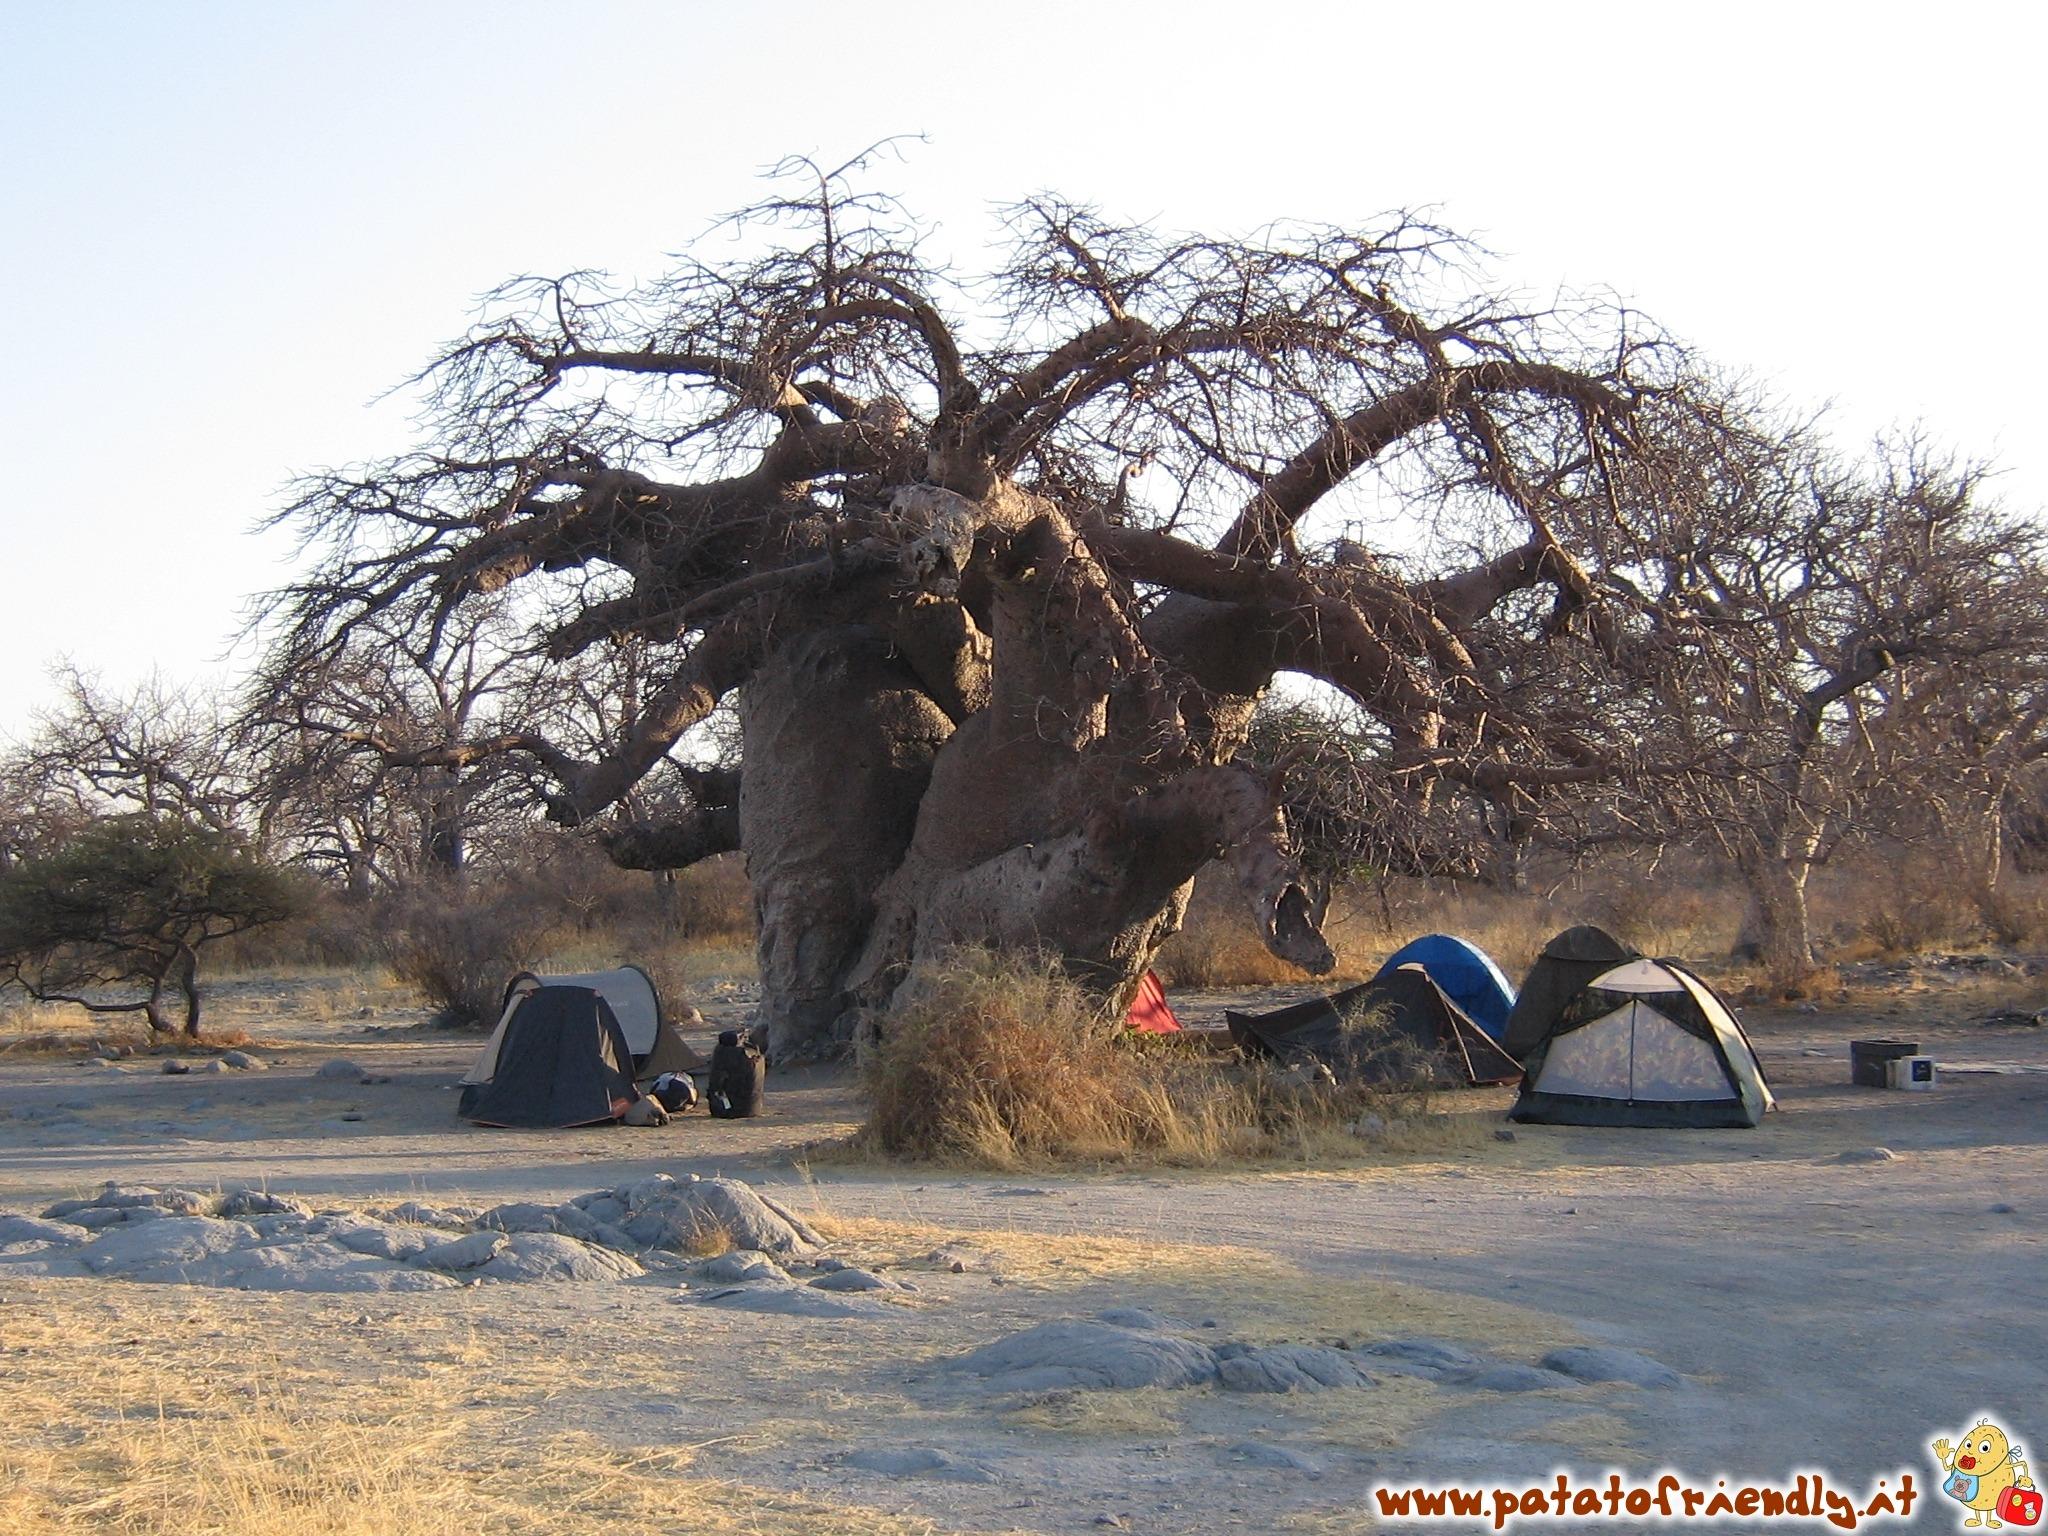 Il campo tendato di Kubu Island in Botswana